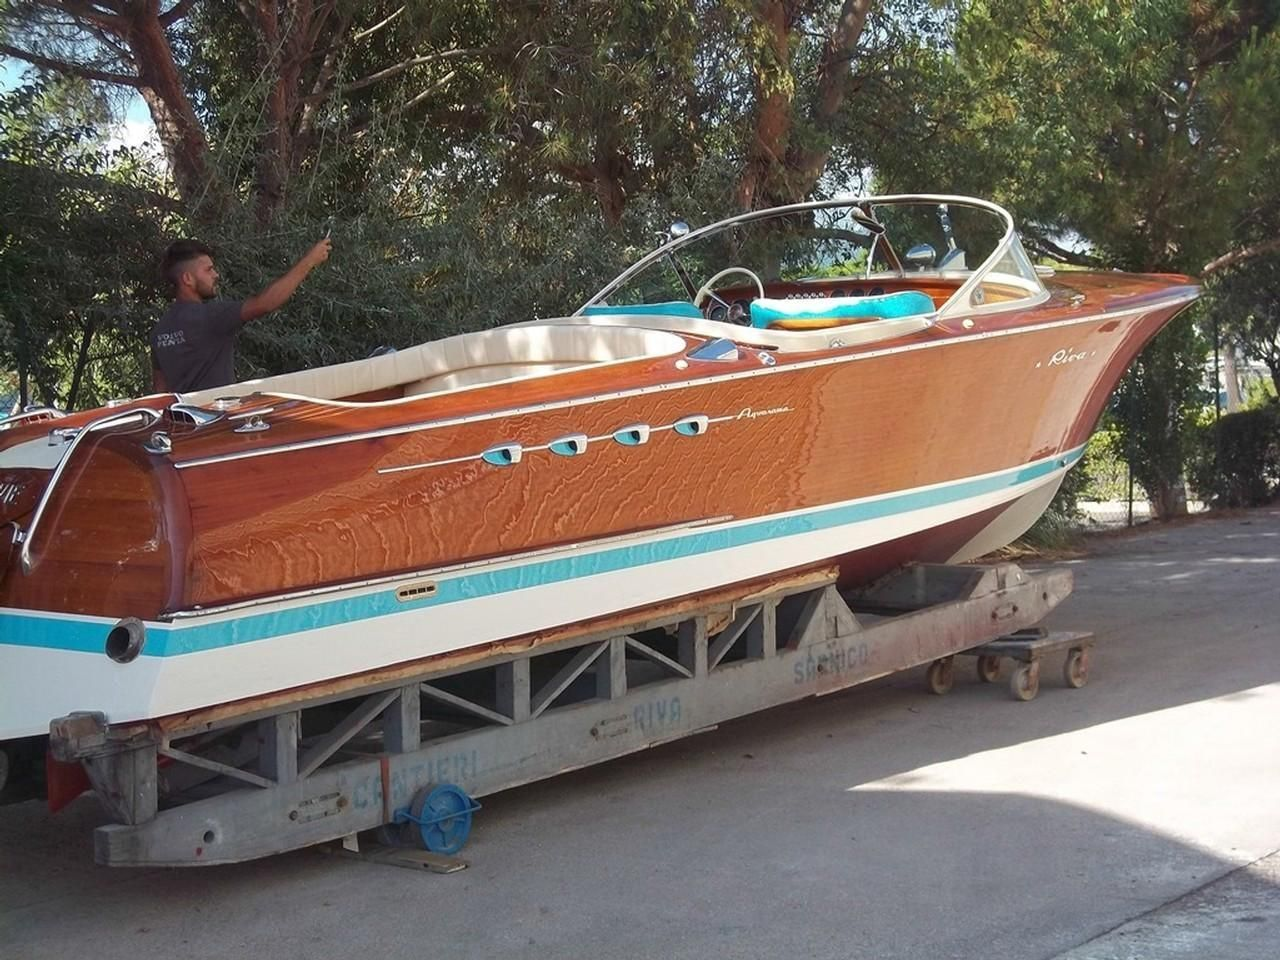 1967 riva aquarama power boat for sale. Black Bedroom Furniture Sets. Home Design Ideas